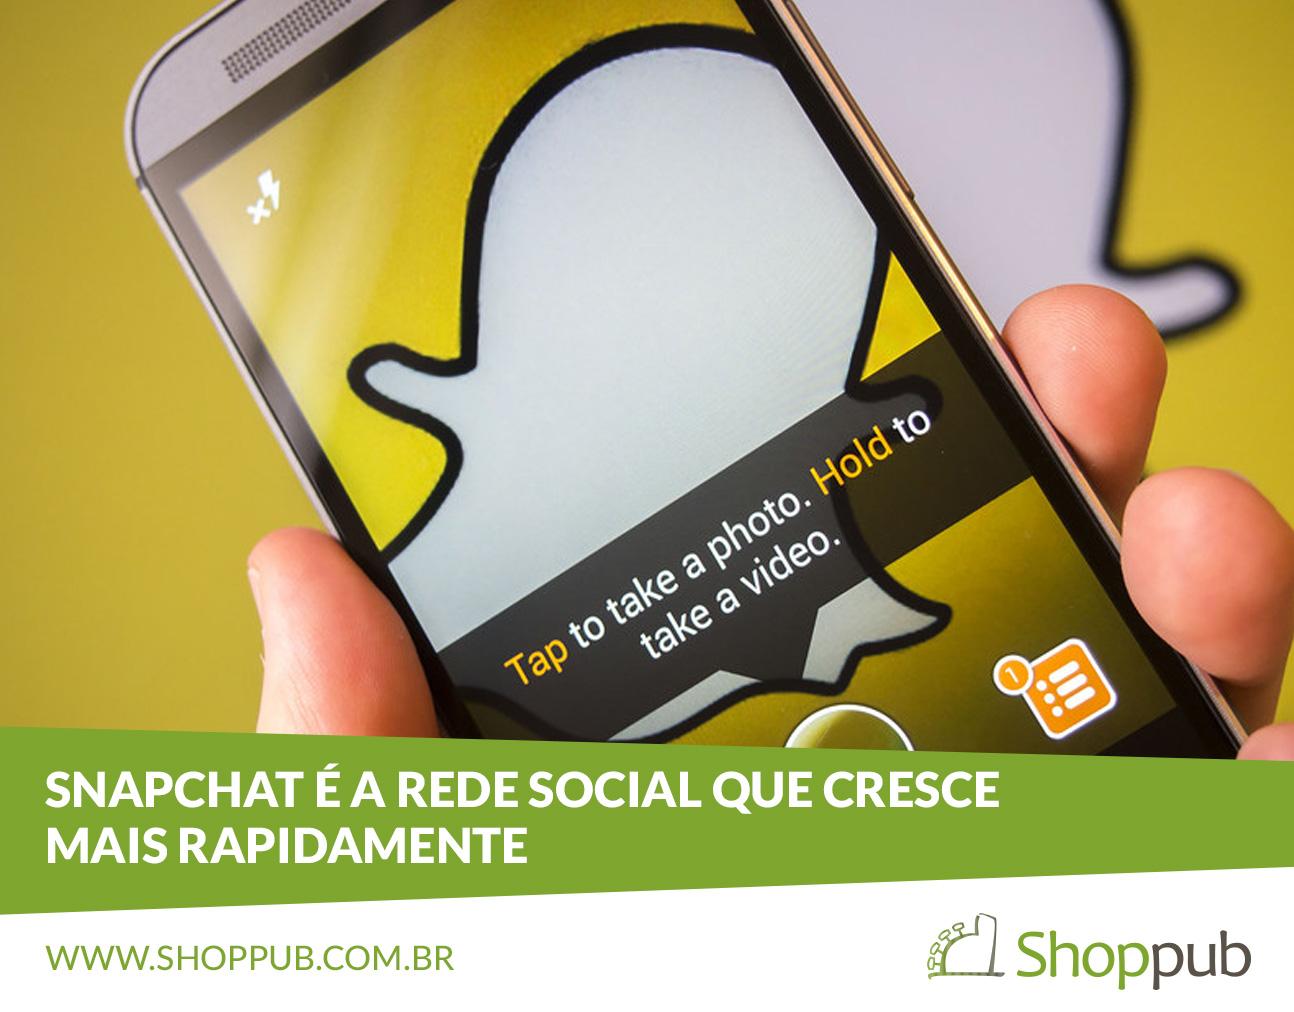 Snapchat é a rede social que cresce mais rapidamente